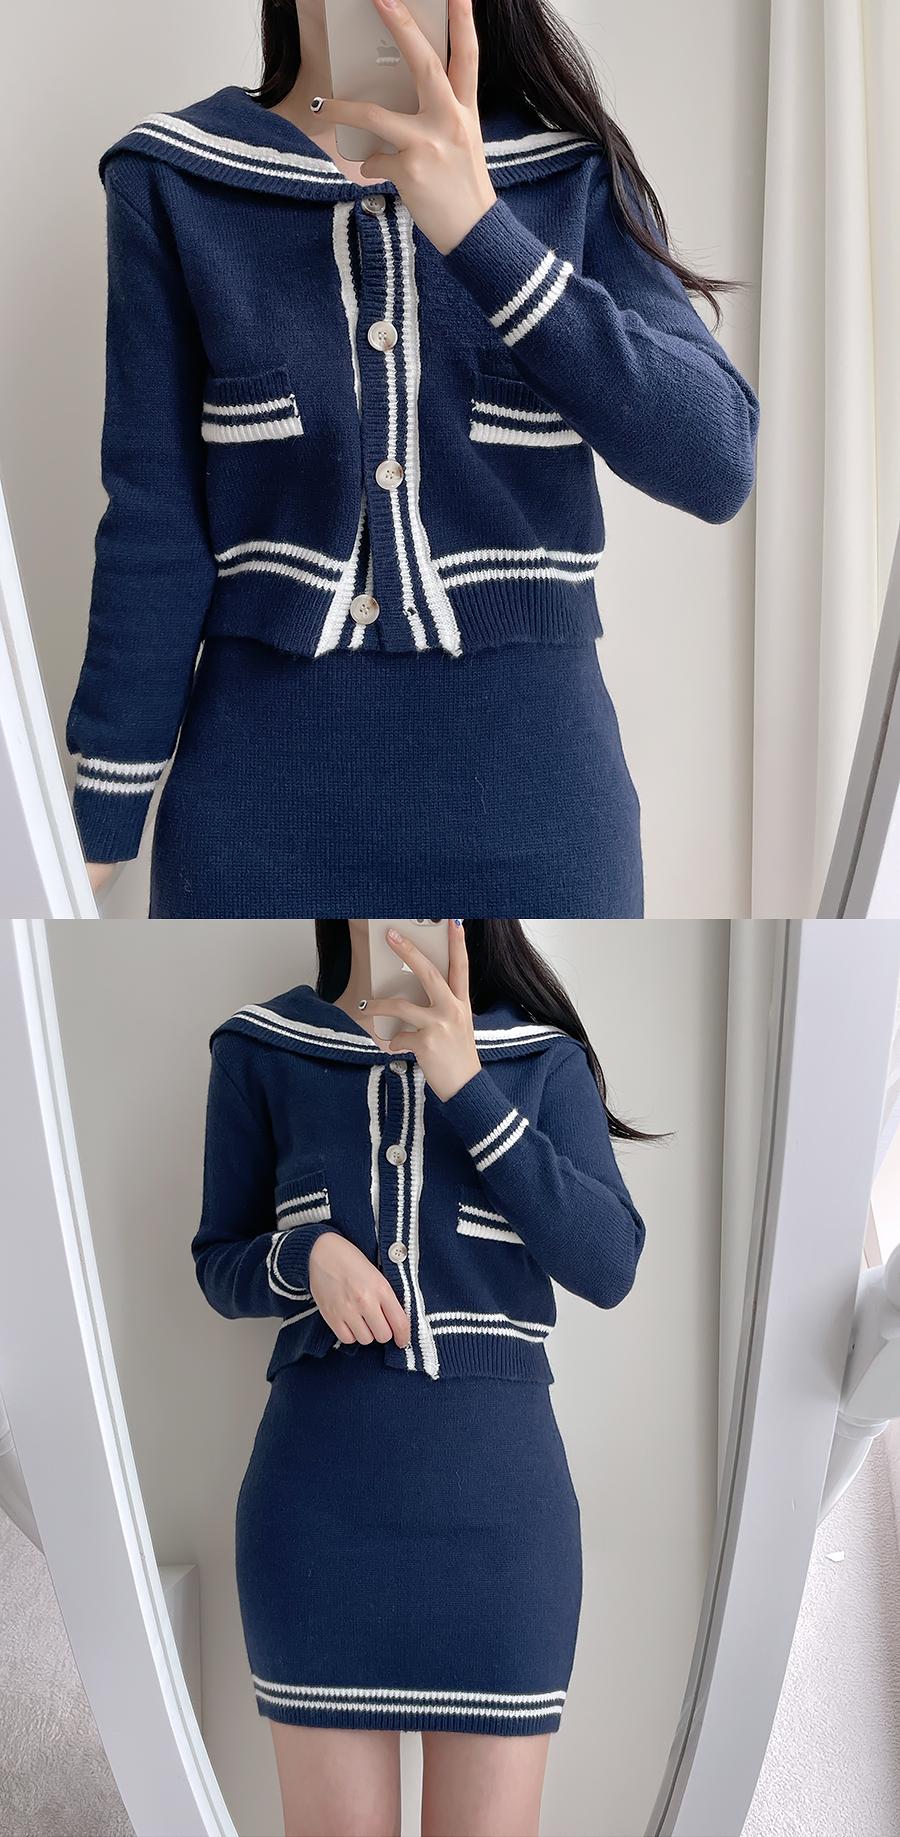 [set]ジョイセーラーニット+ミニスカート2color